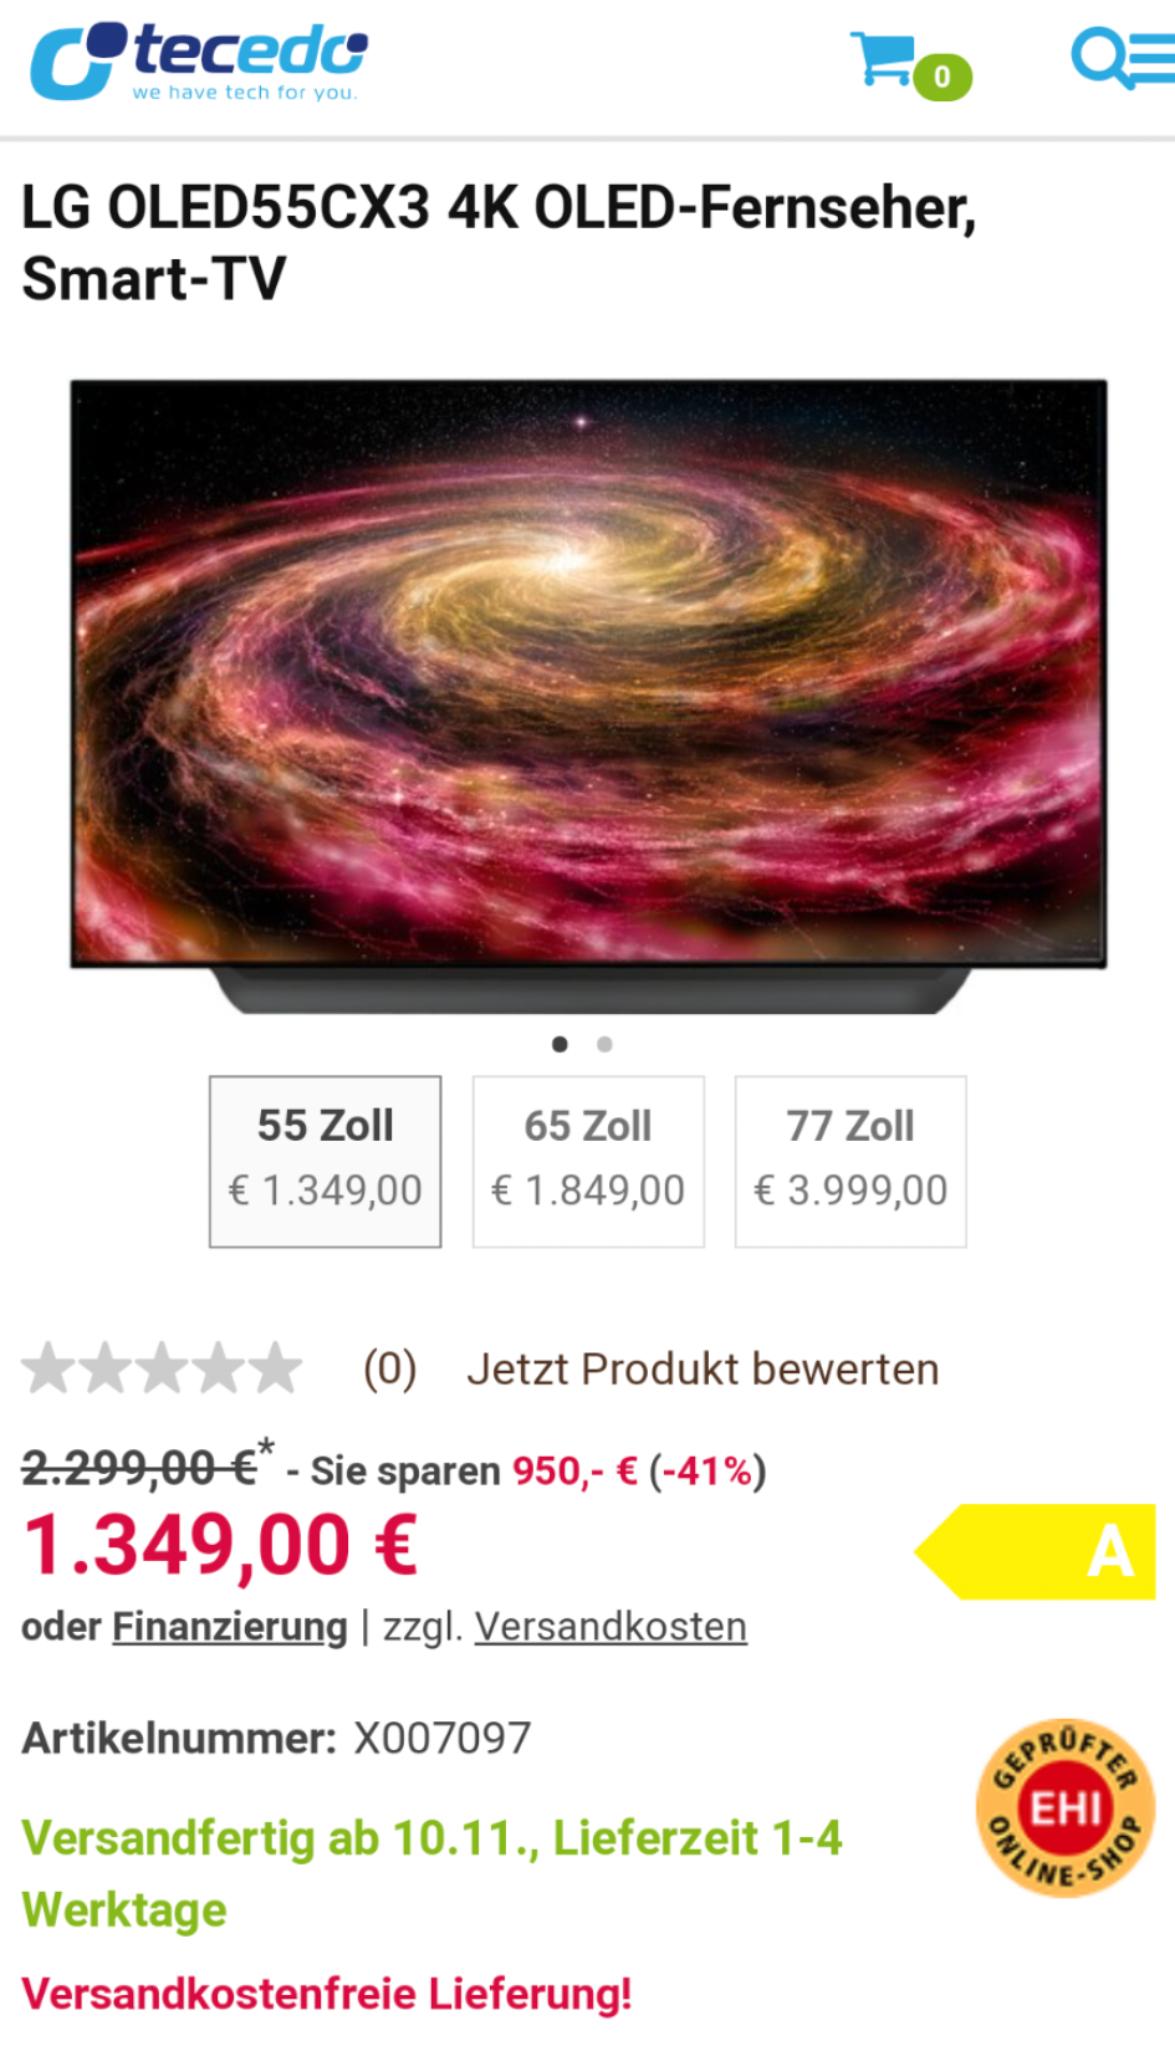 LG OLED55CX3 4K OLED-Fernseher, Smart-TV